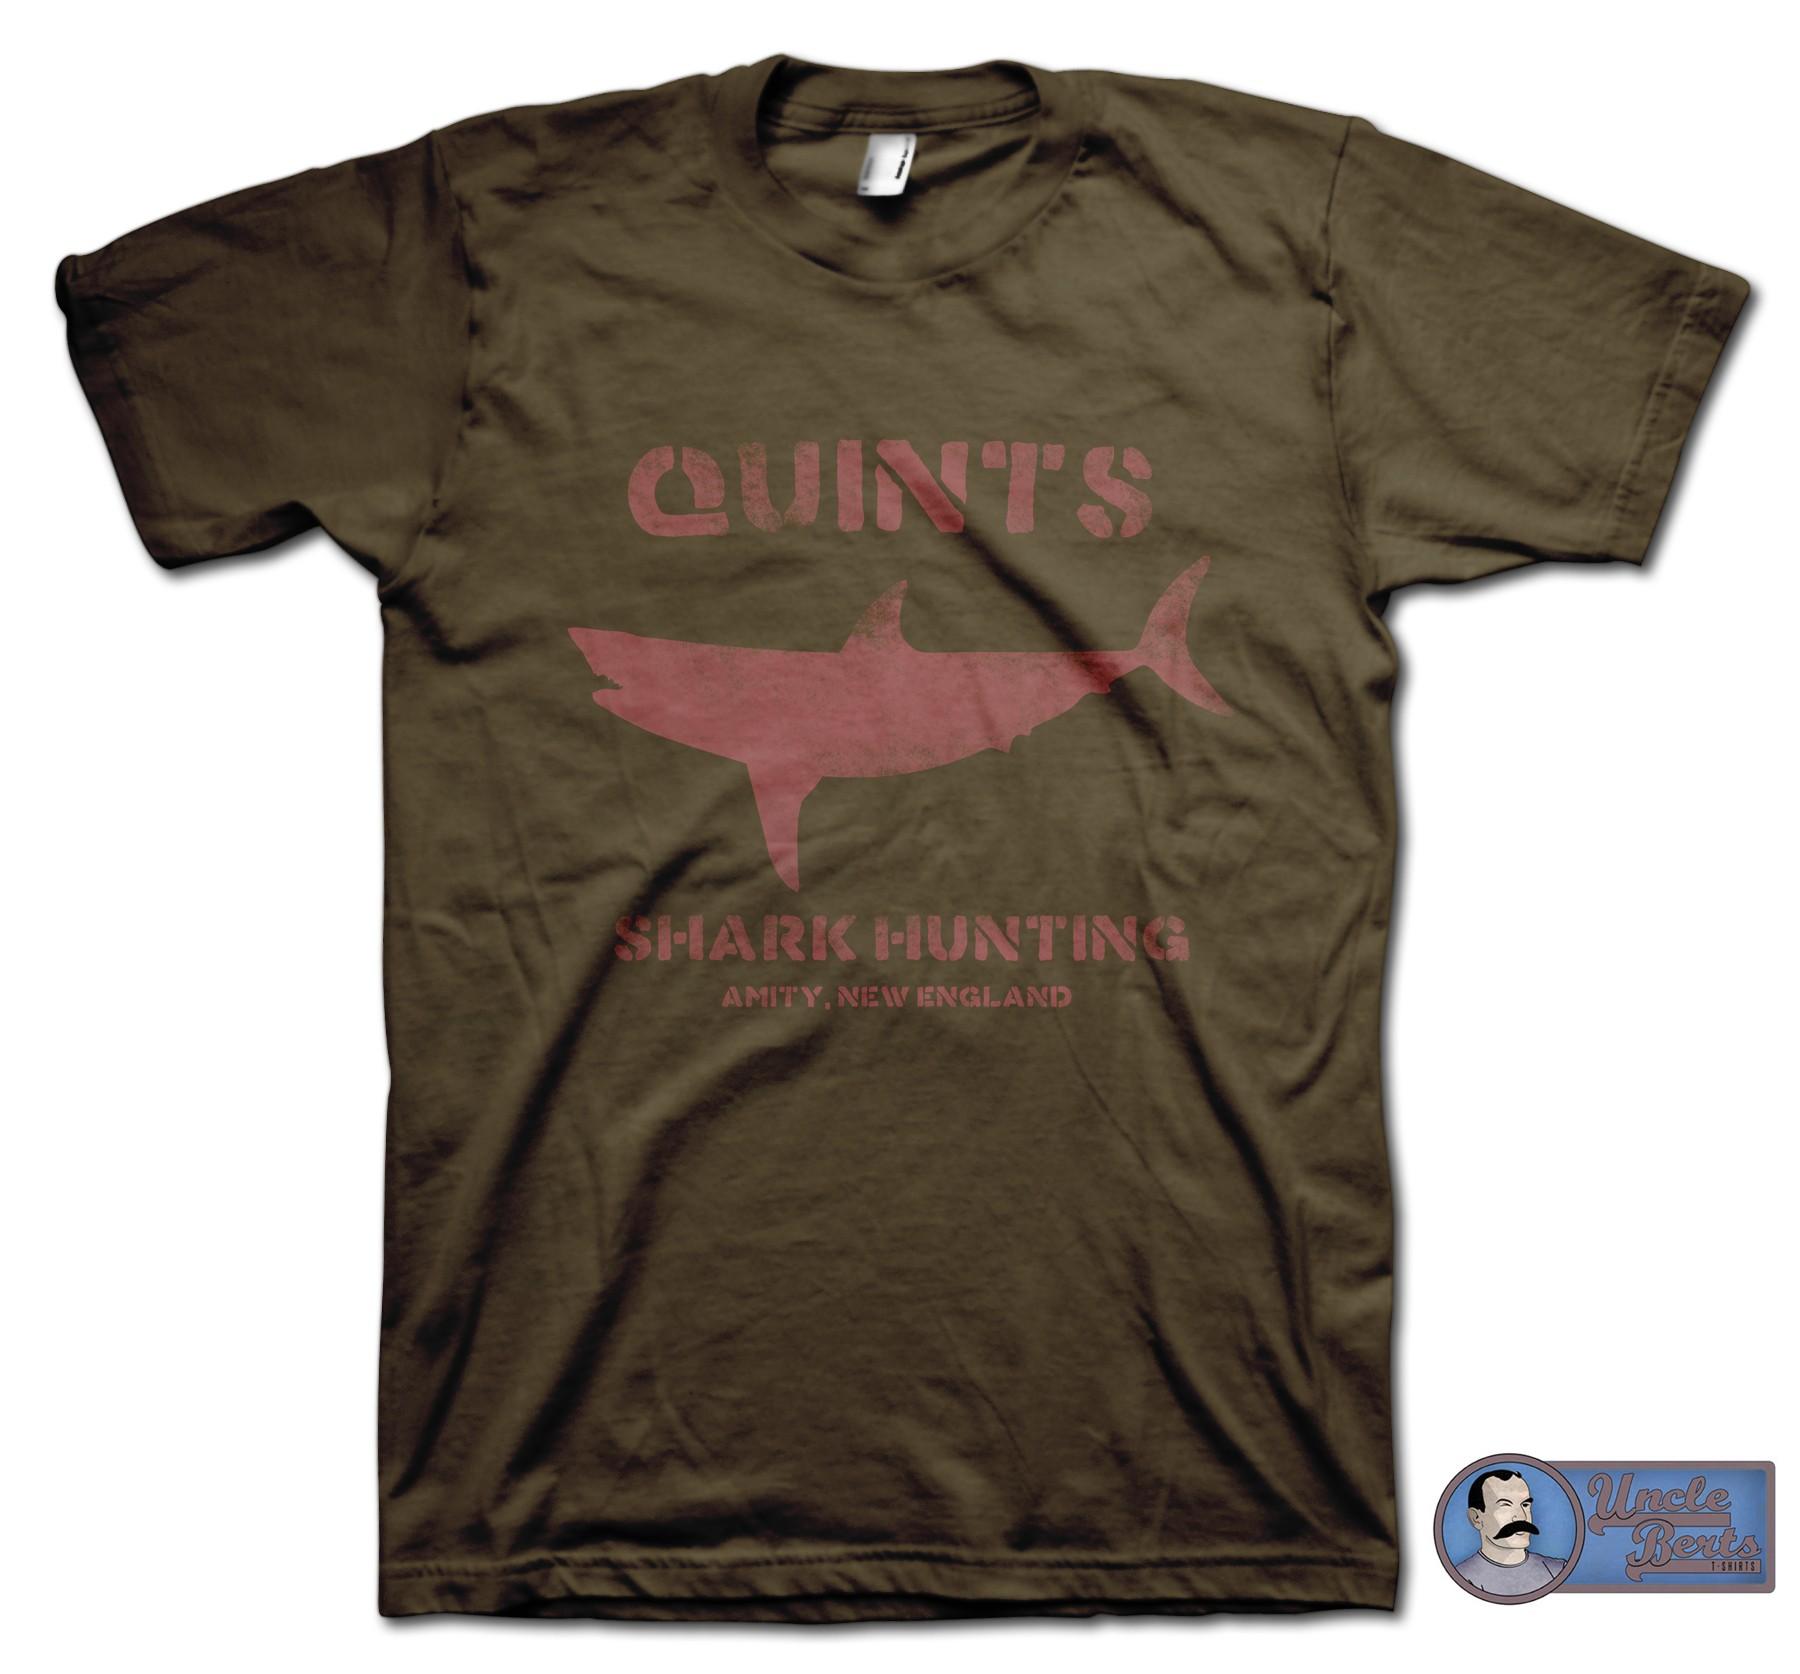 JAWS (1975) Inspired Quints Shark Hunting T-Shirt